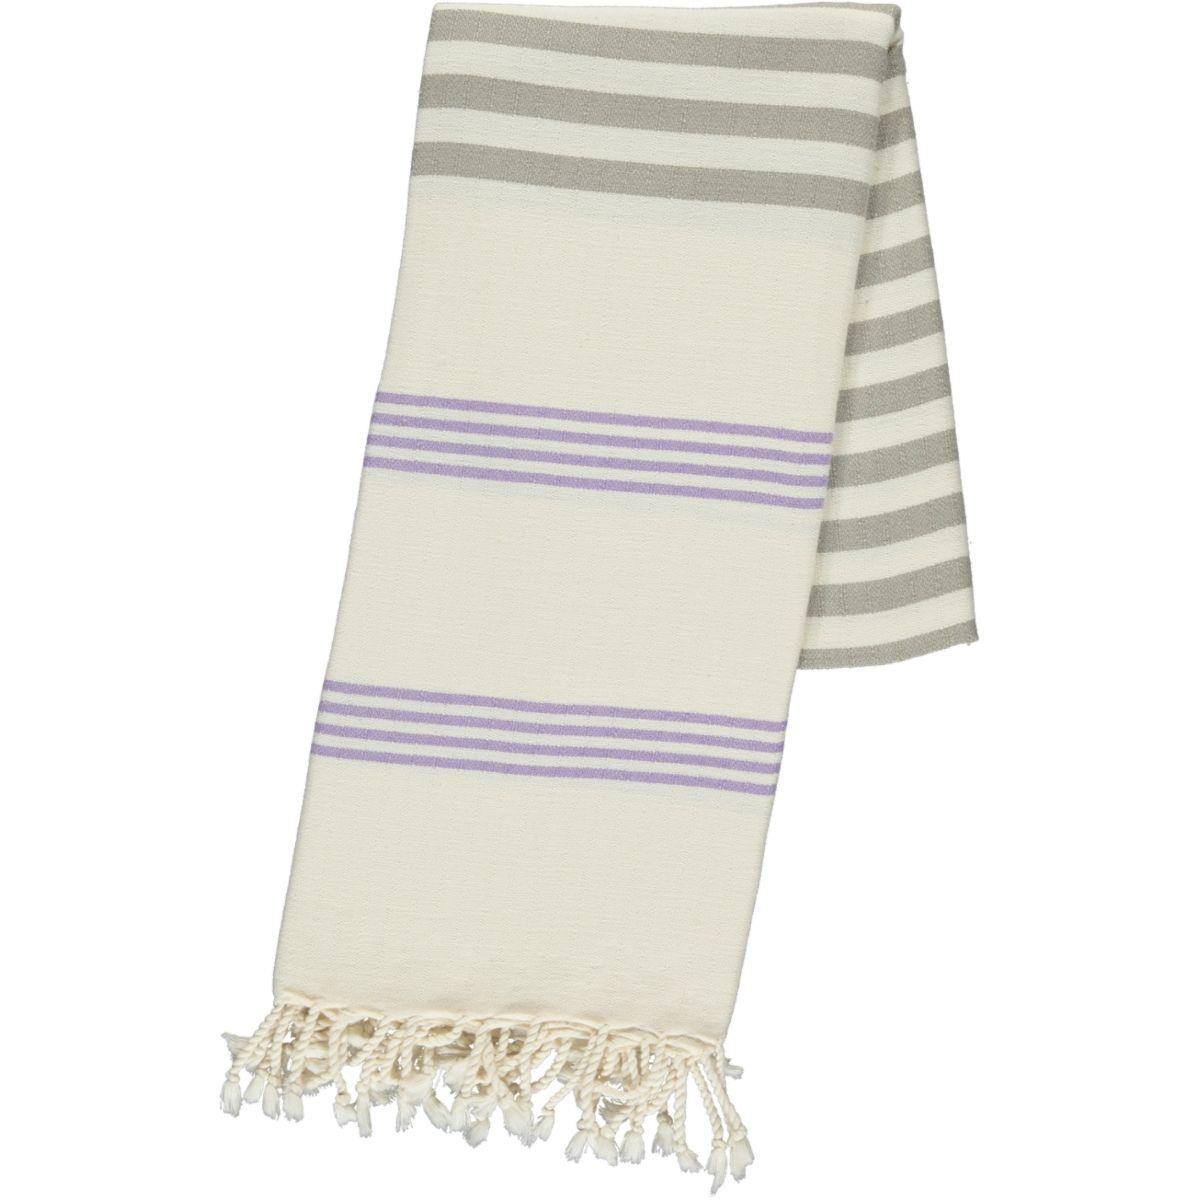 Peshtemal / Towel - Sultan FUN - Lilac / Taupe